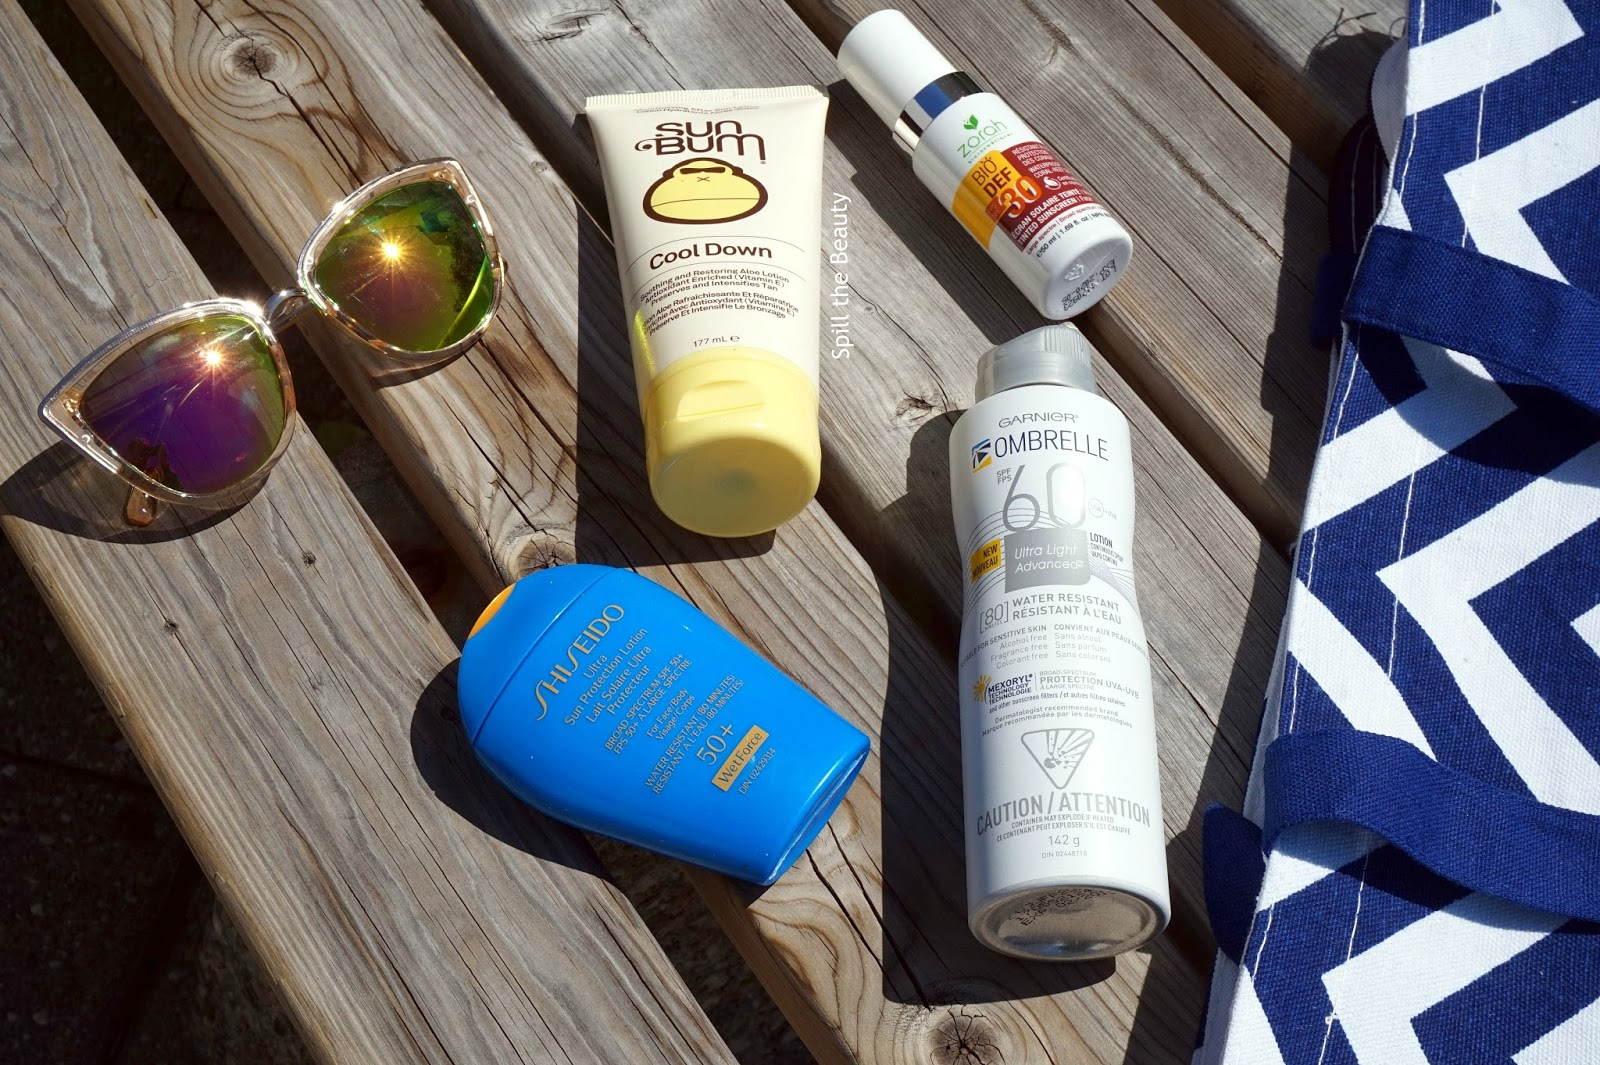 sunscreen roundup sun bum shiseido garnier ombrelle zorah